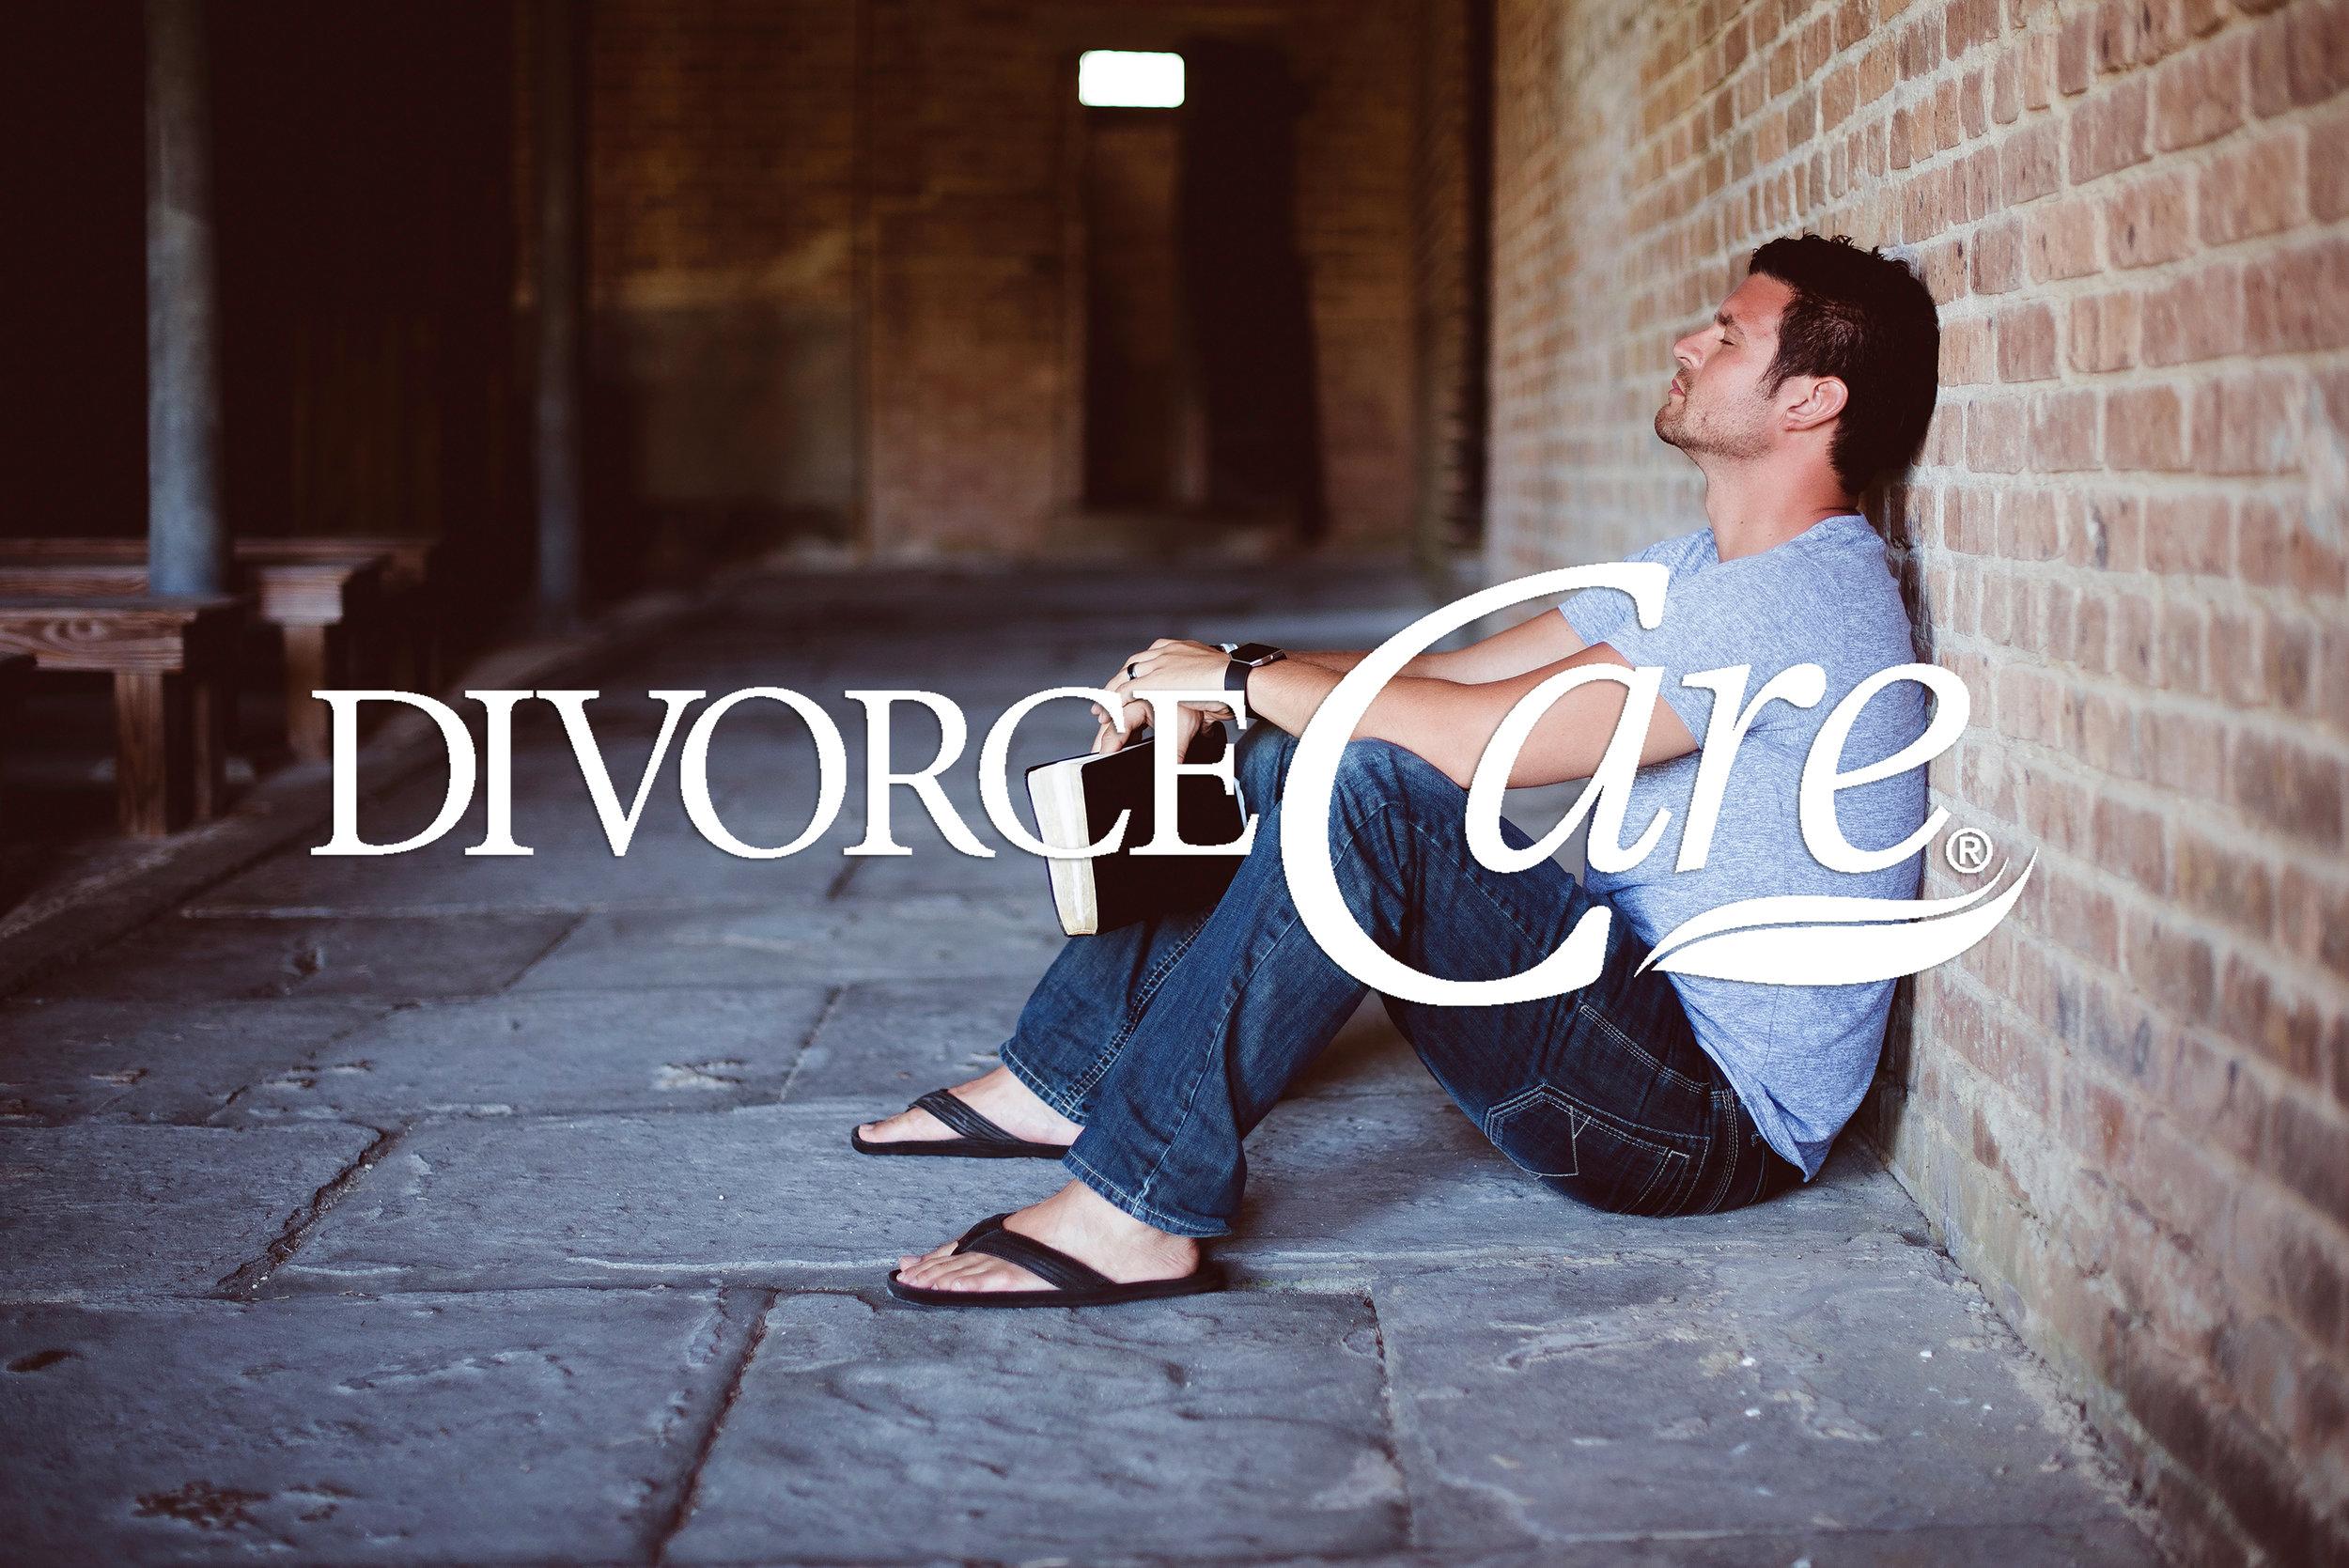 DivorceCare Web Image.jpg